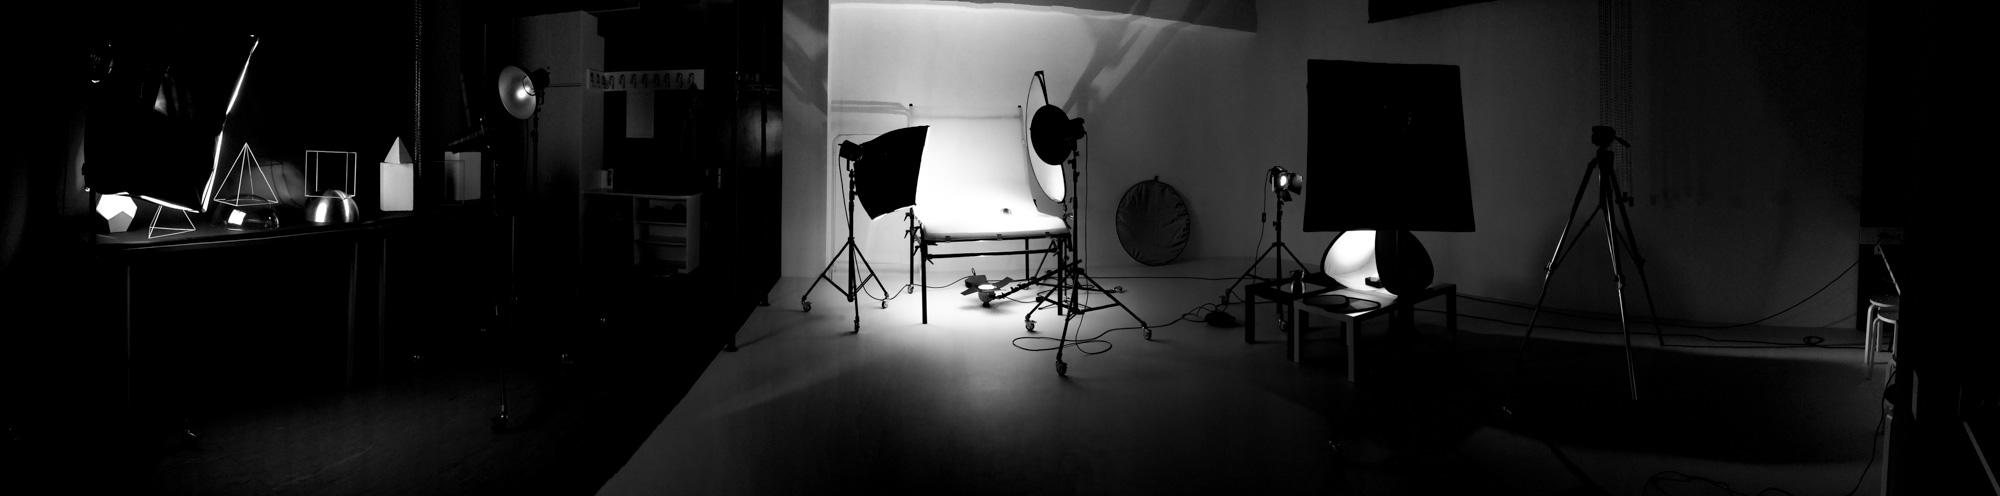 studio-1vaja